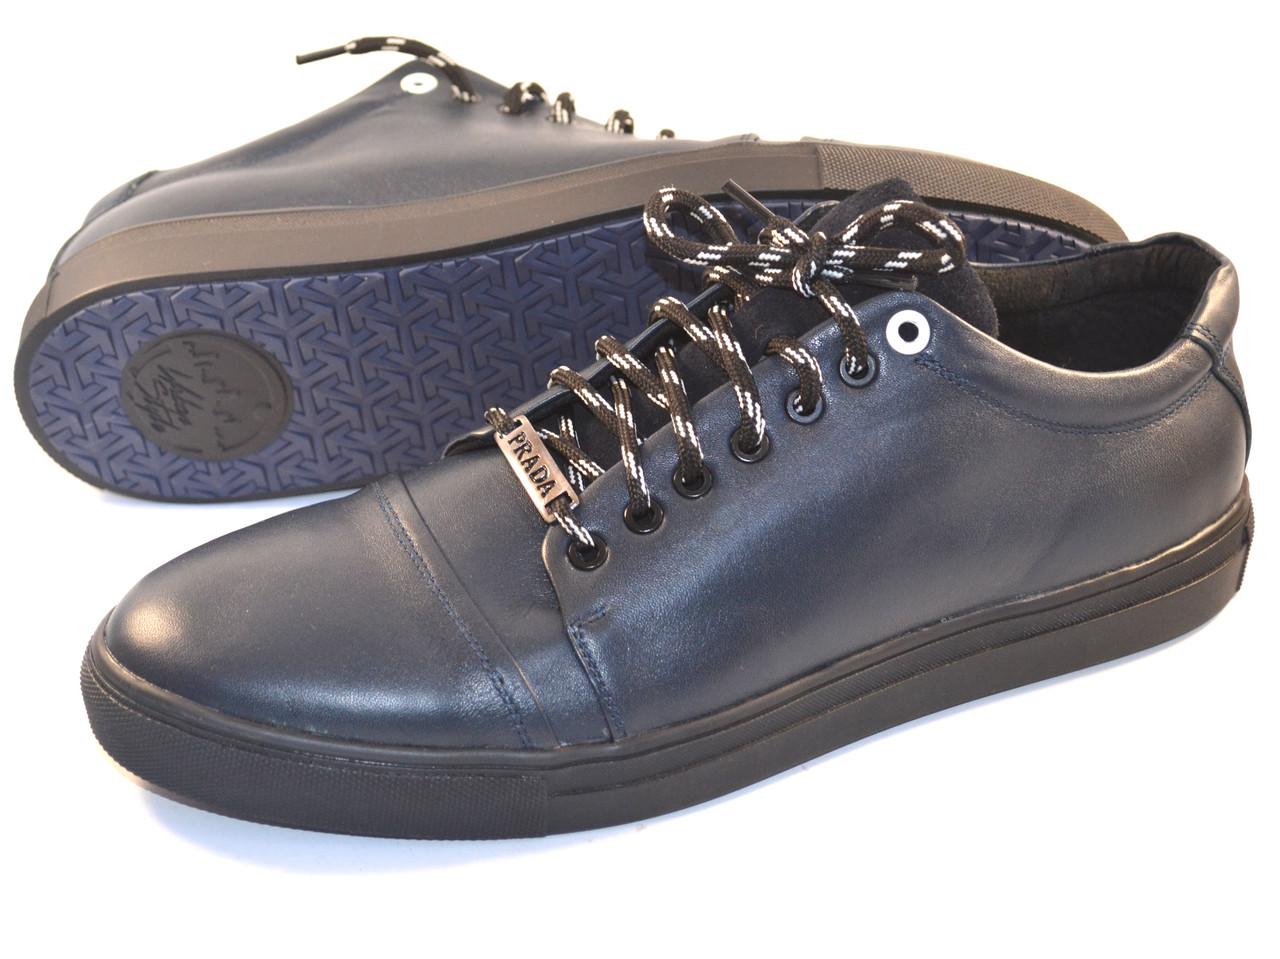 8d544969 ... Кожаные кроссовки мужские кеды синие Rosso Avangard Gushe Blu , фото 7  ...